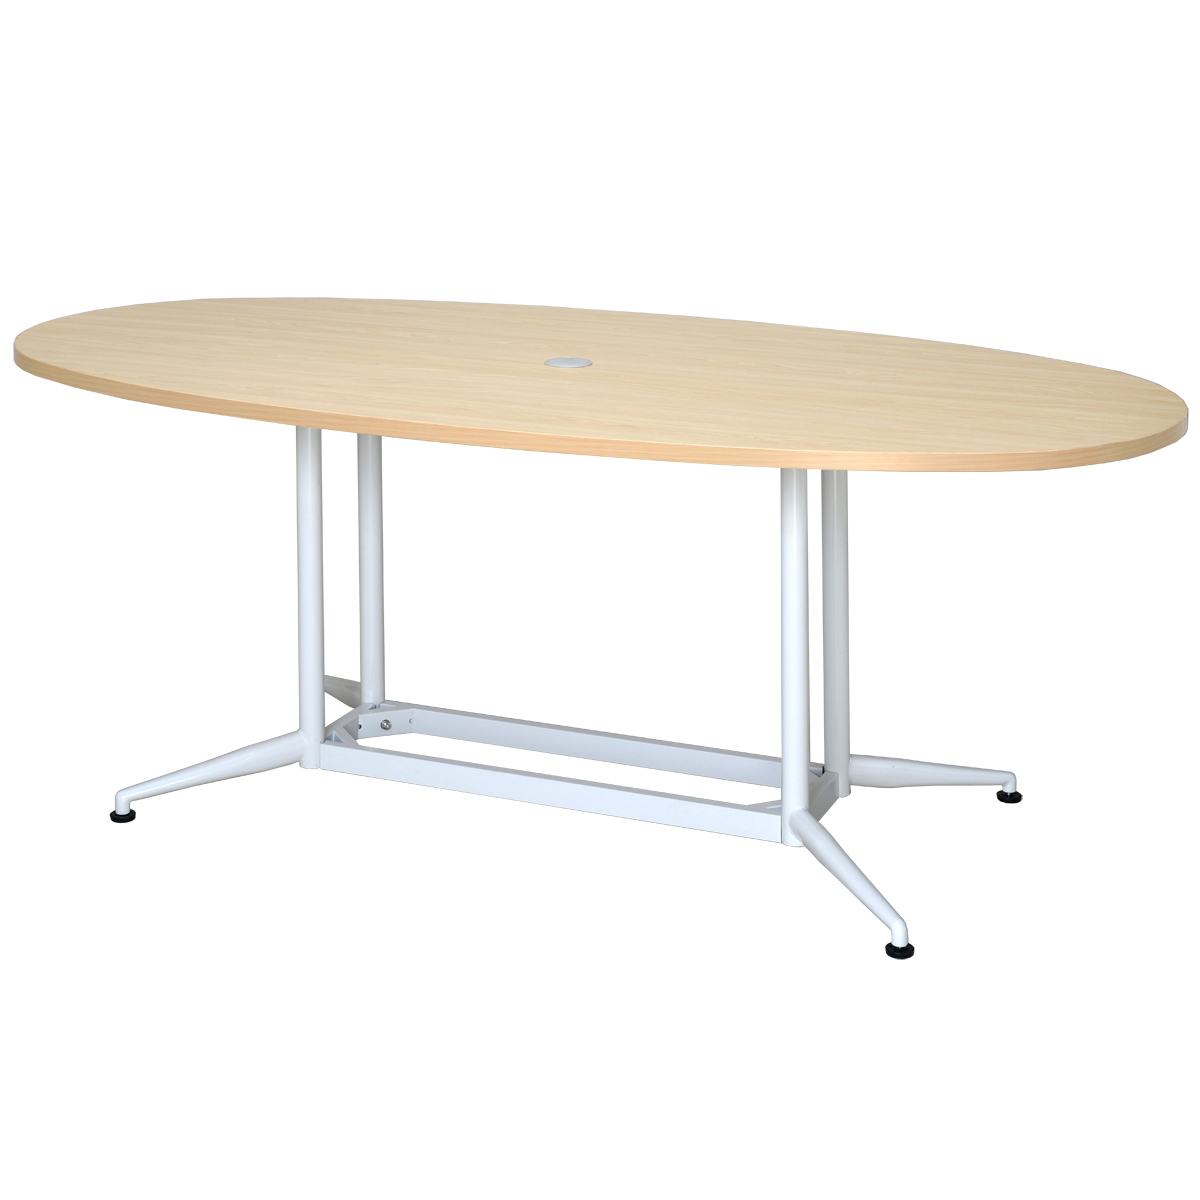 OAオーバルテーブル W1800xD900 ナチュラル RFOVT-OA1890NA【送料無料】  アールエフヤマカワ RFyamakawa 会議テーブル 会議用テーブル 楕円